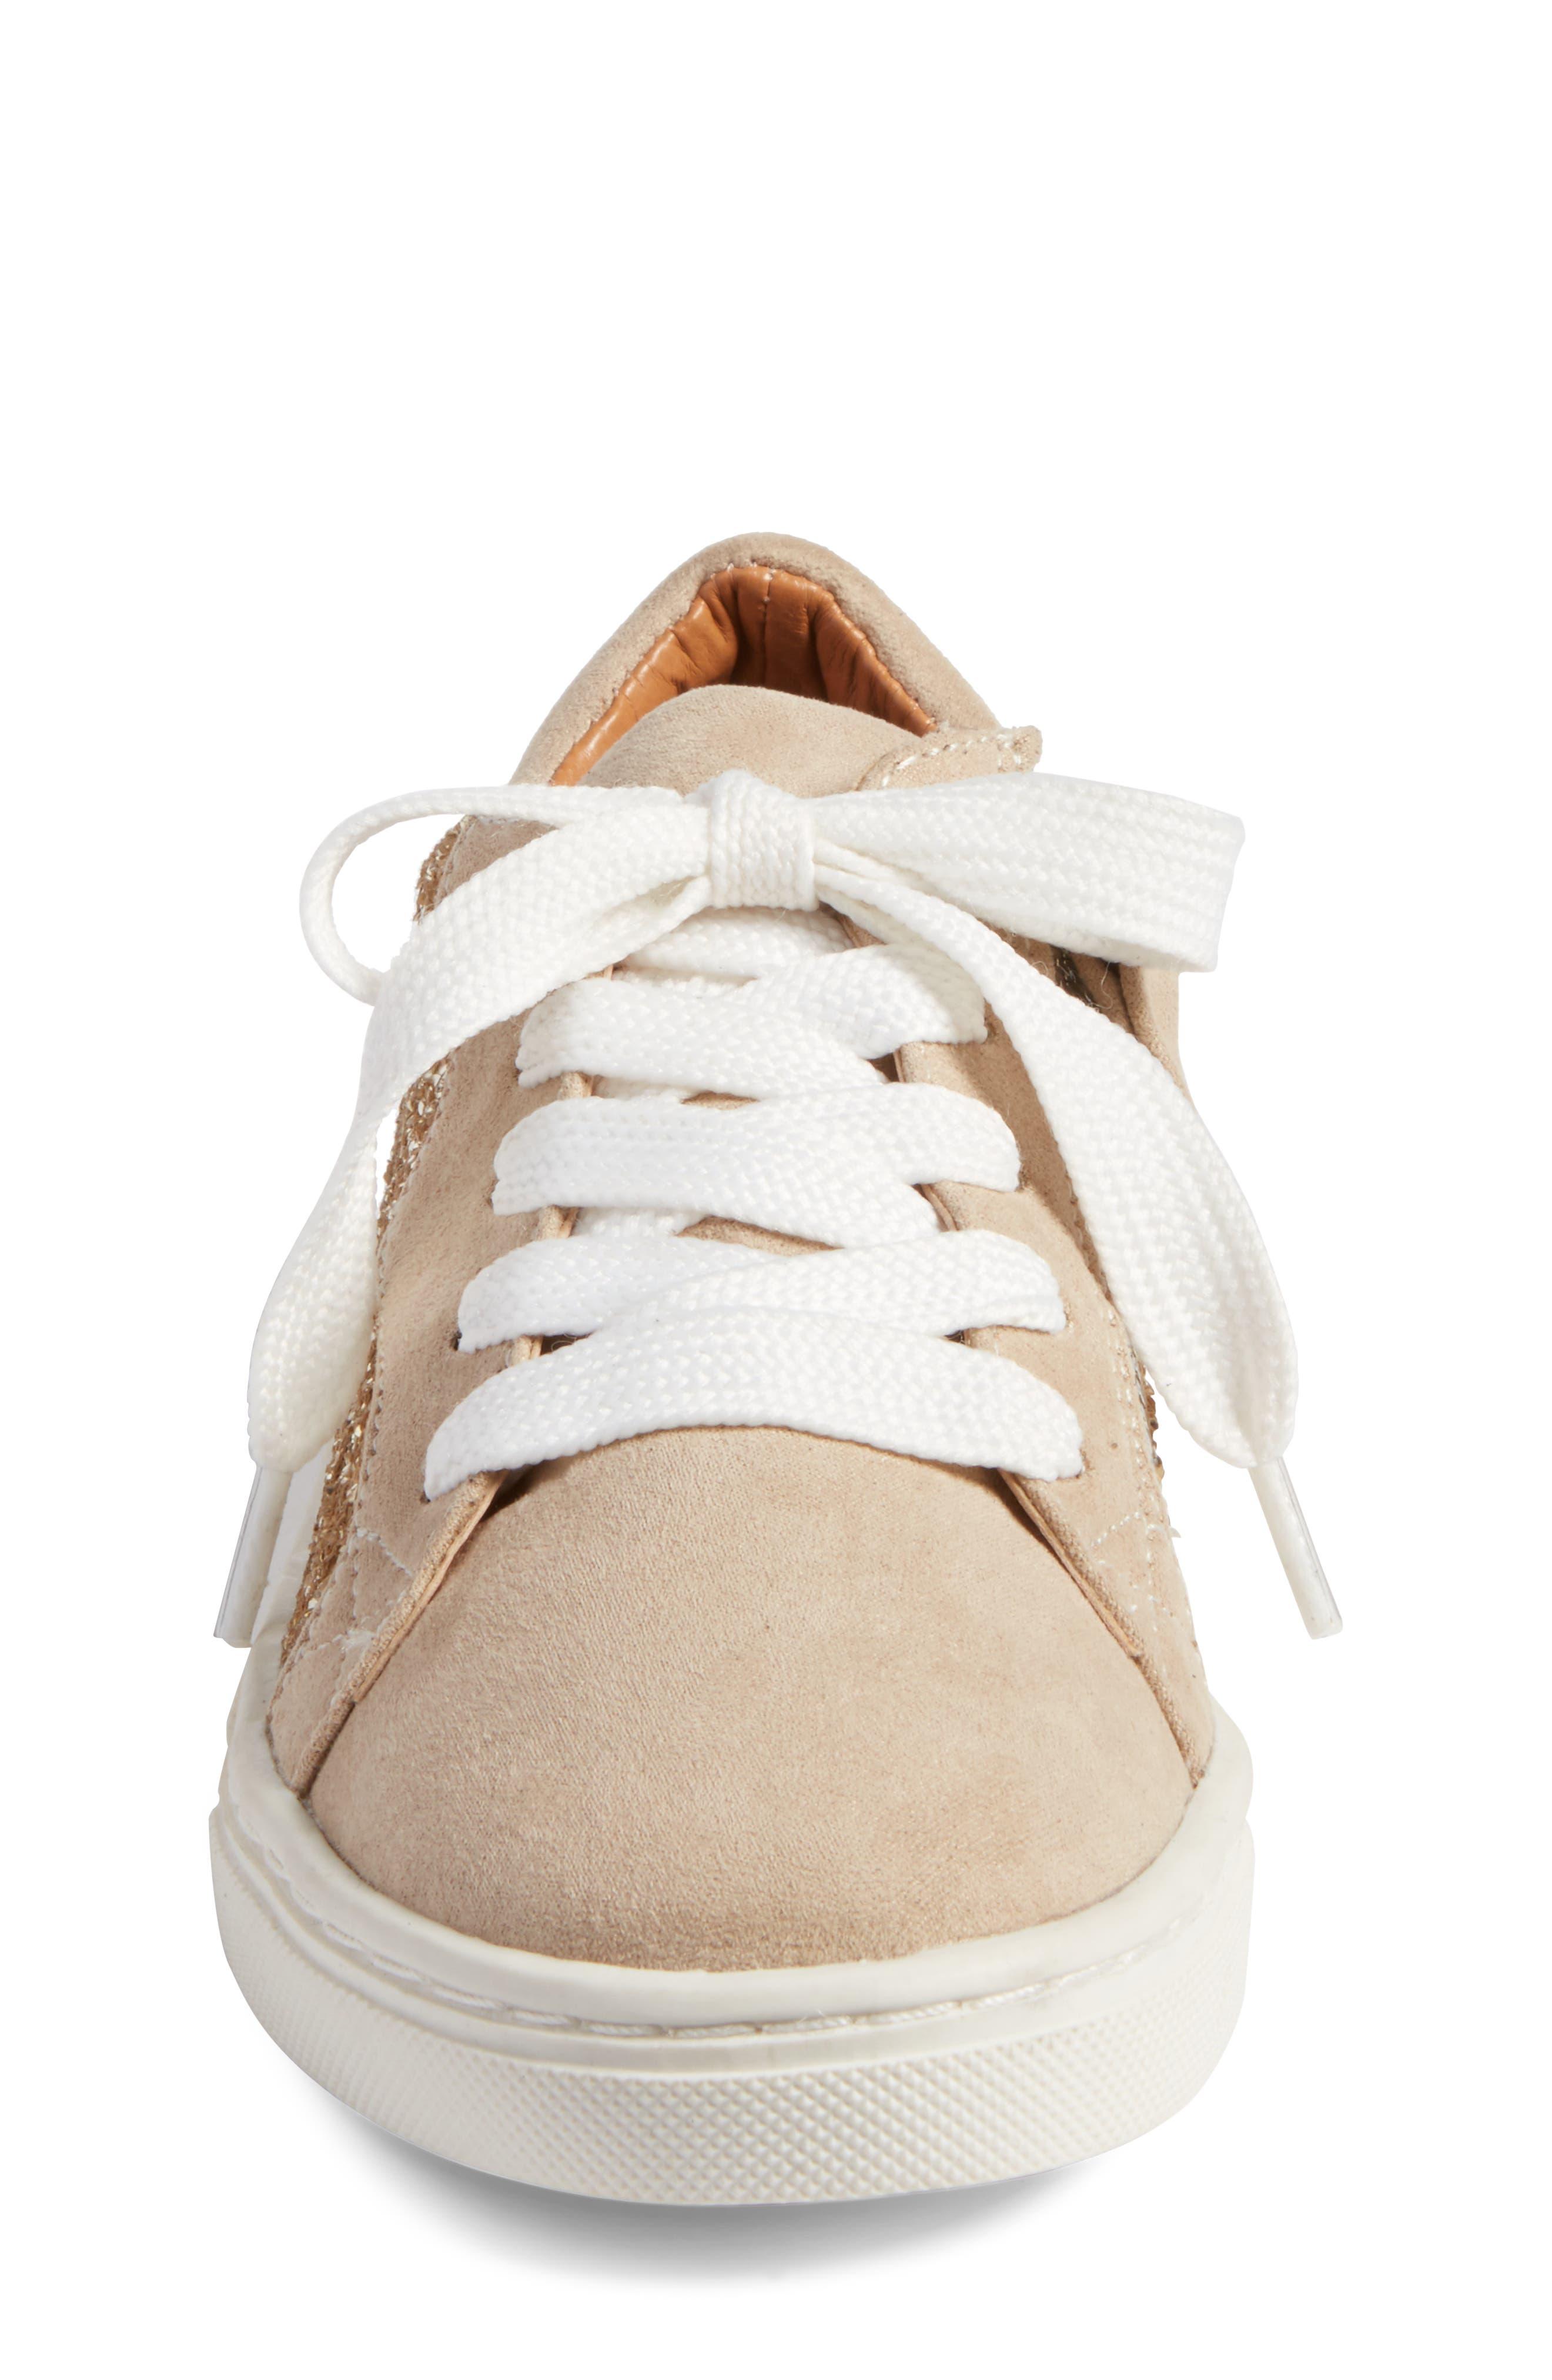 Zaida Low Top Sneaker,                             Alternate thumbnail 4, color,                             Gold Glitter